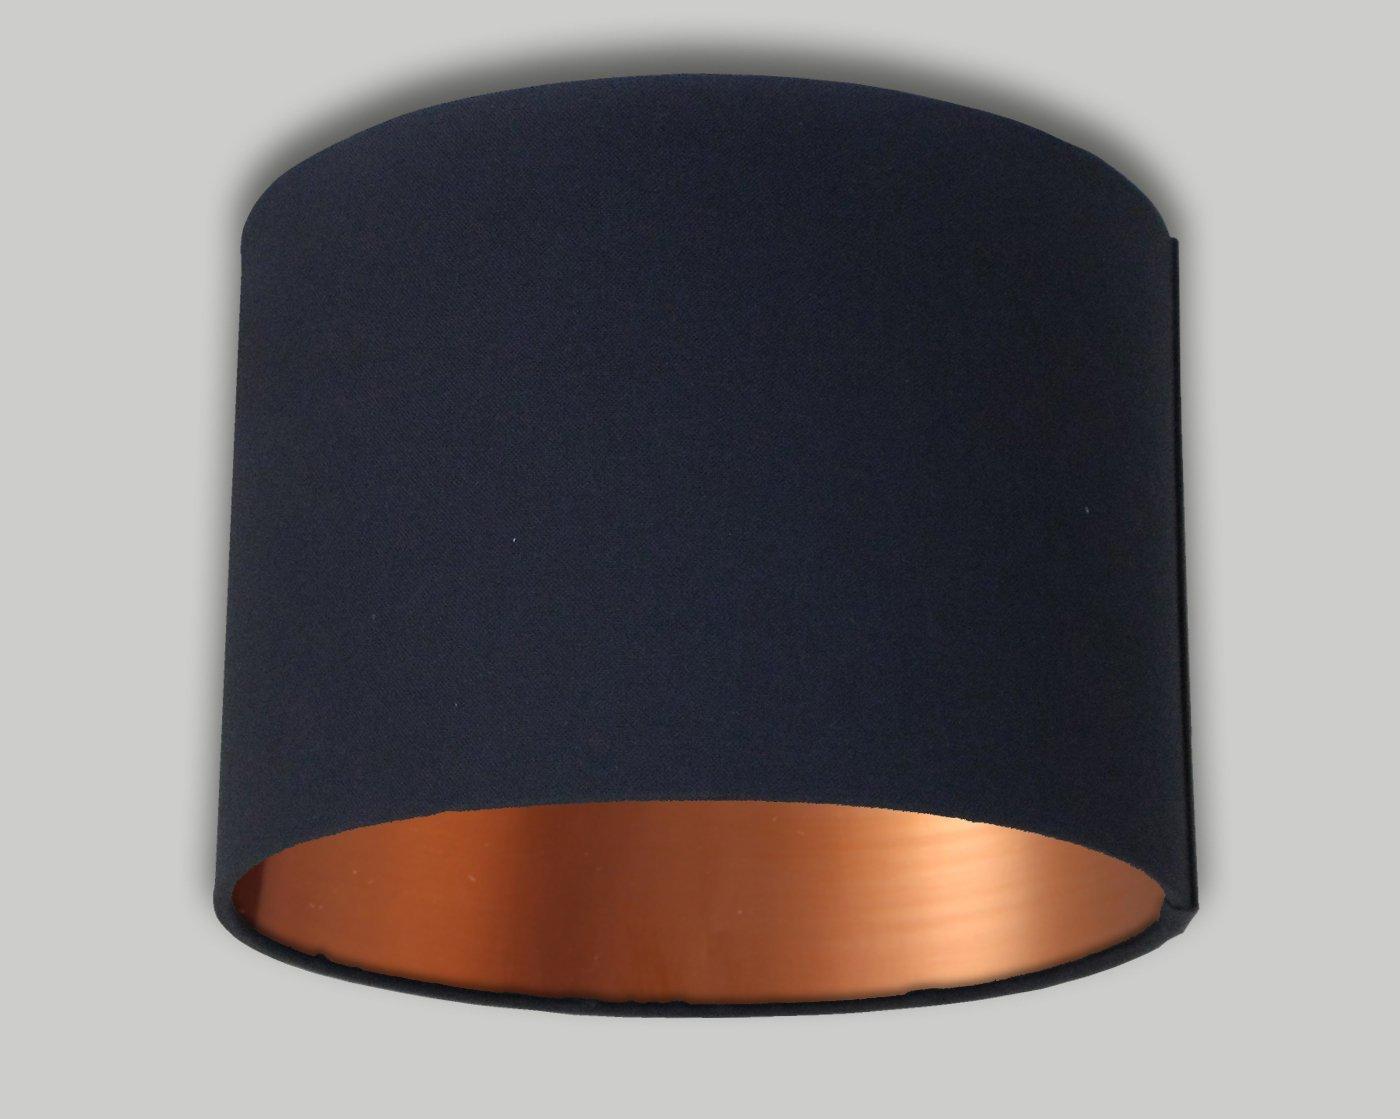 Black Drum Lampshade Brushed Copper Inner 20cm 25cm 30cm 35cm 40cm 50cm 60cm 70cm Lamp Shade Lightshade